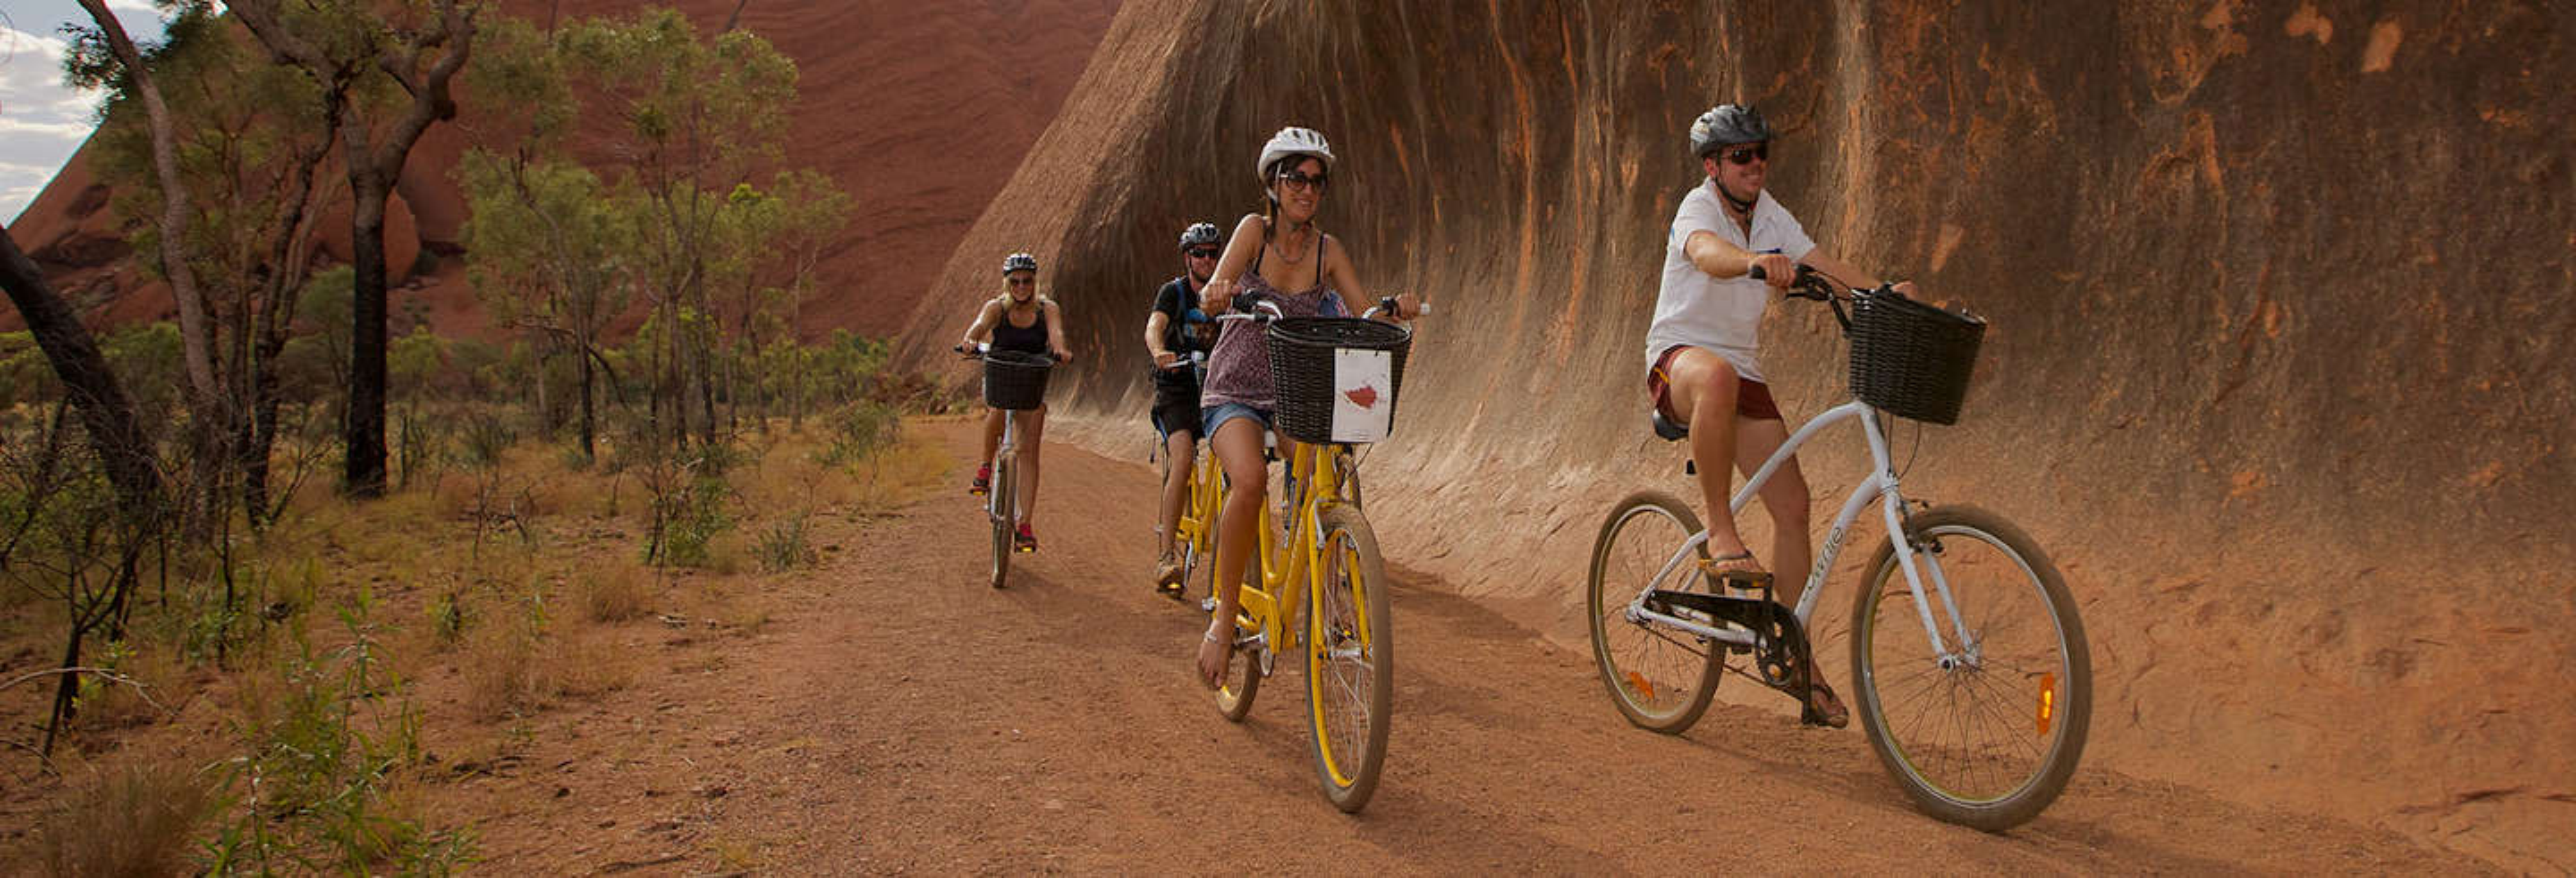 Noleggio bici a Uluru-Kata Tjuta